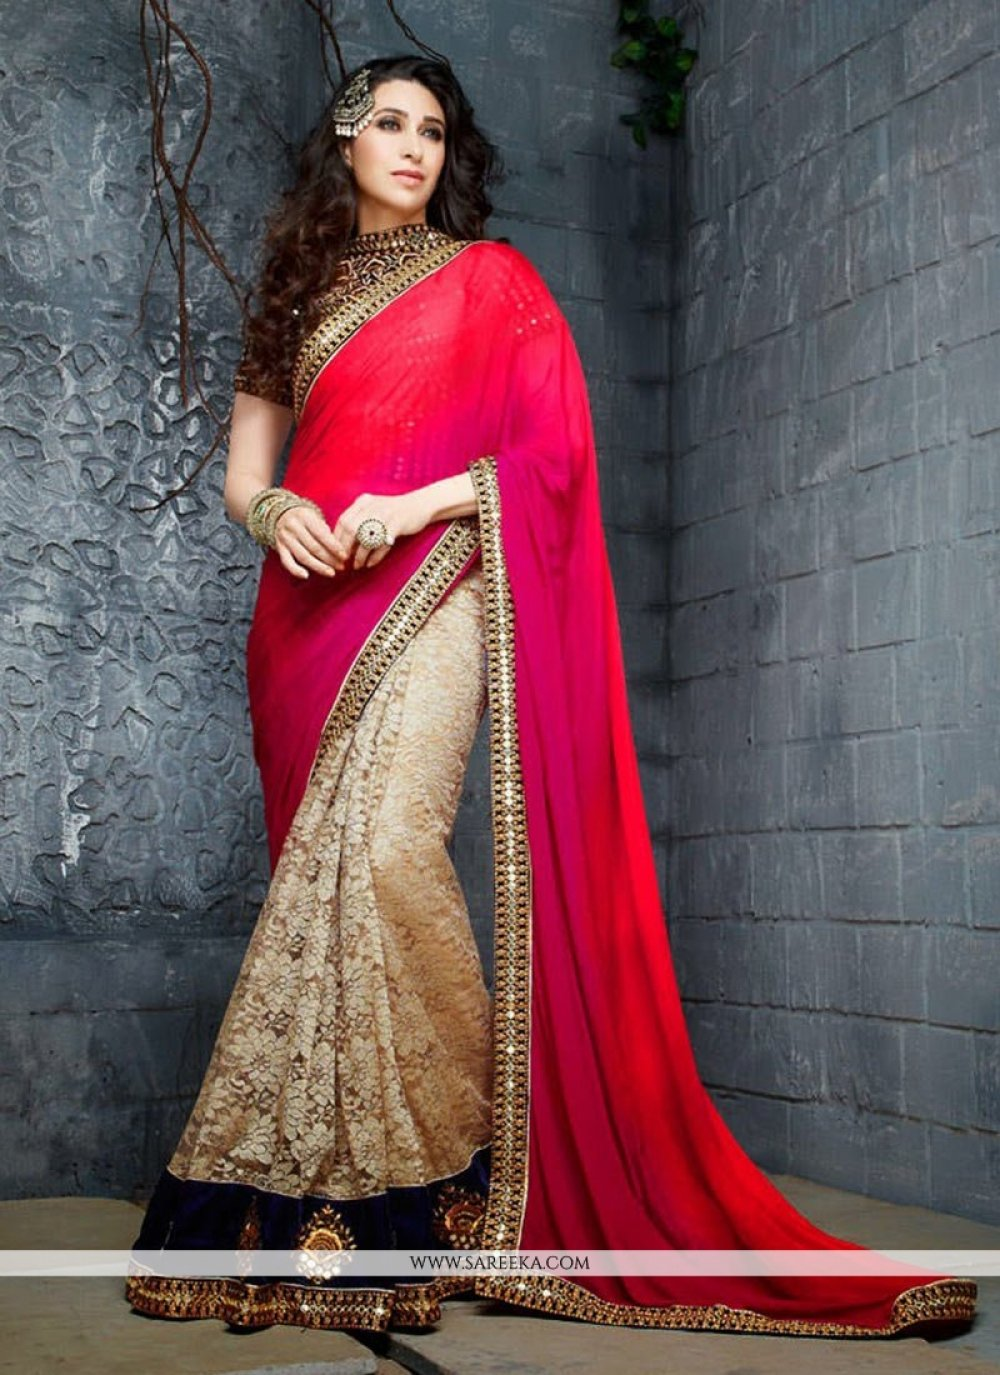 Karisma Kapoor Red And Cream Half And Half Saree